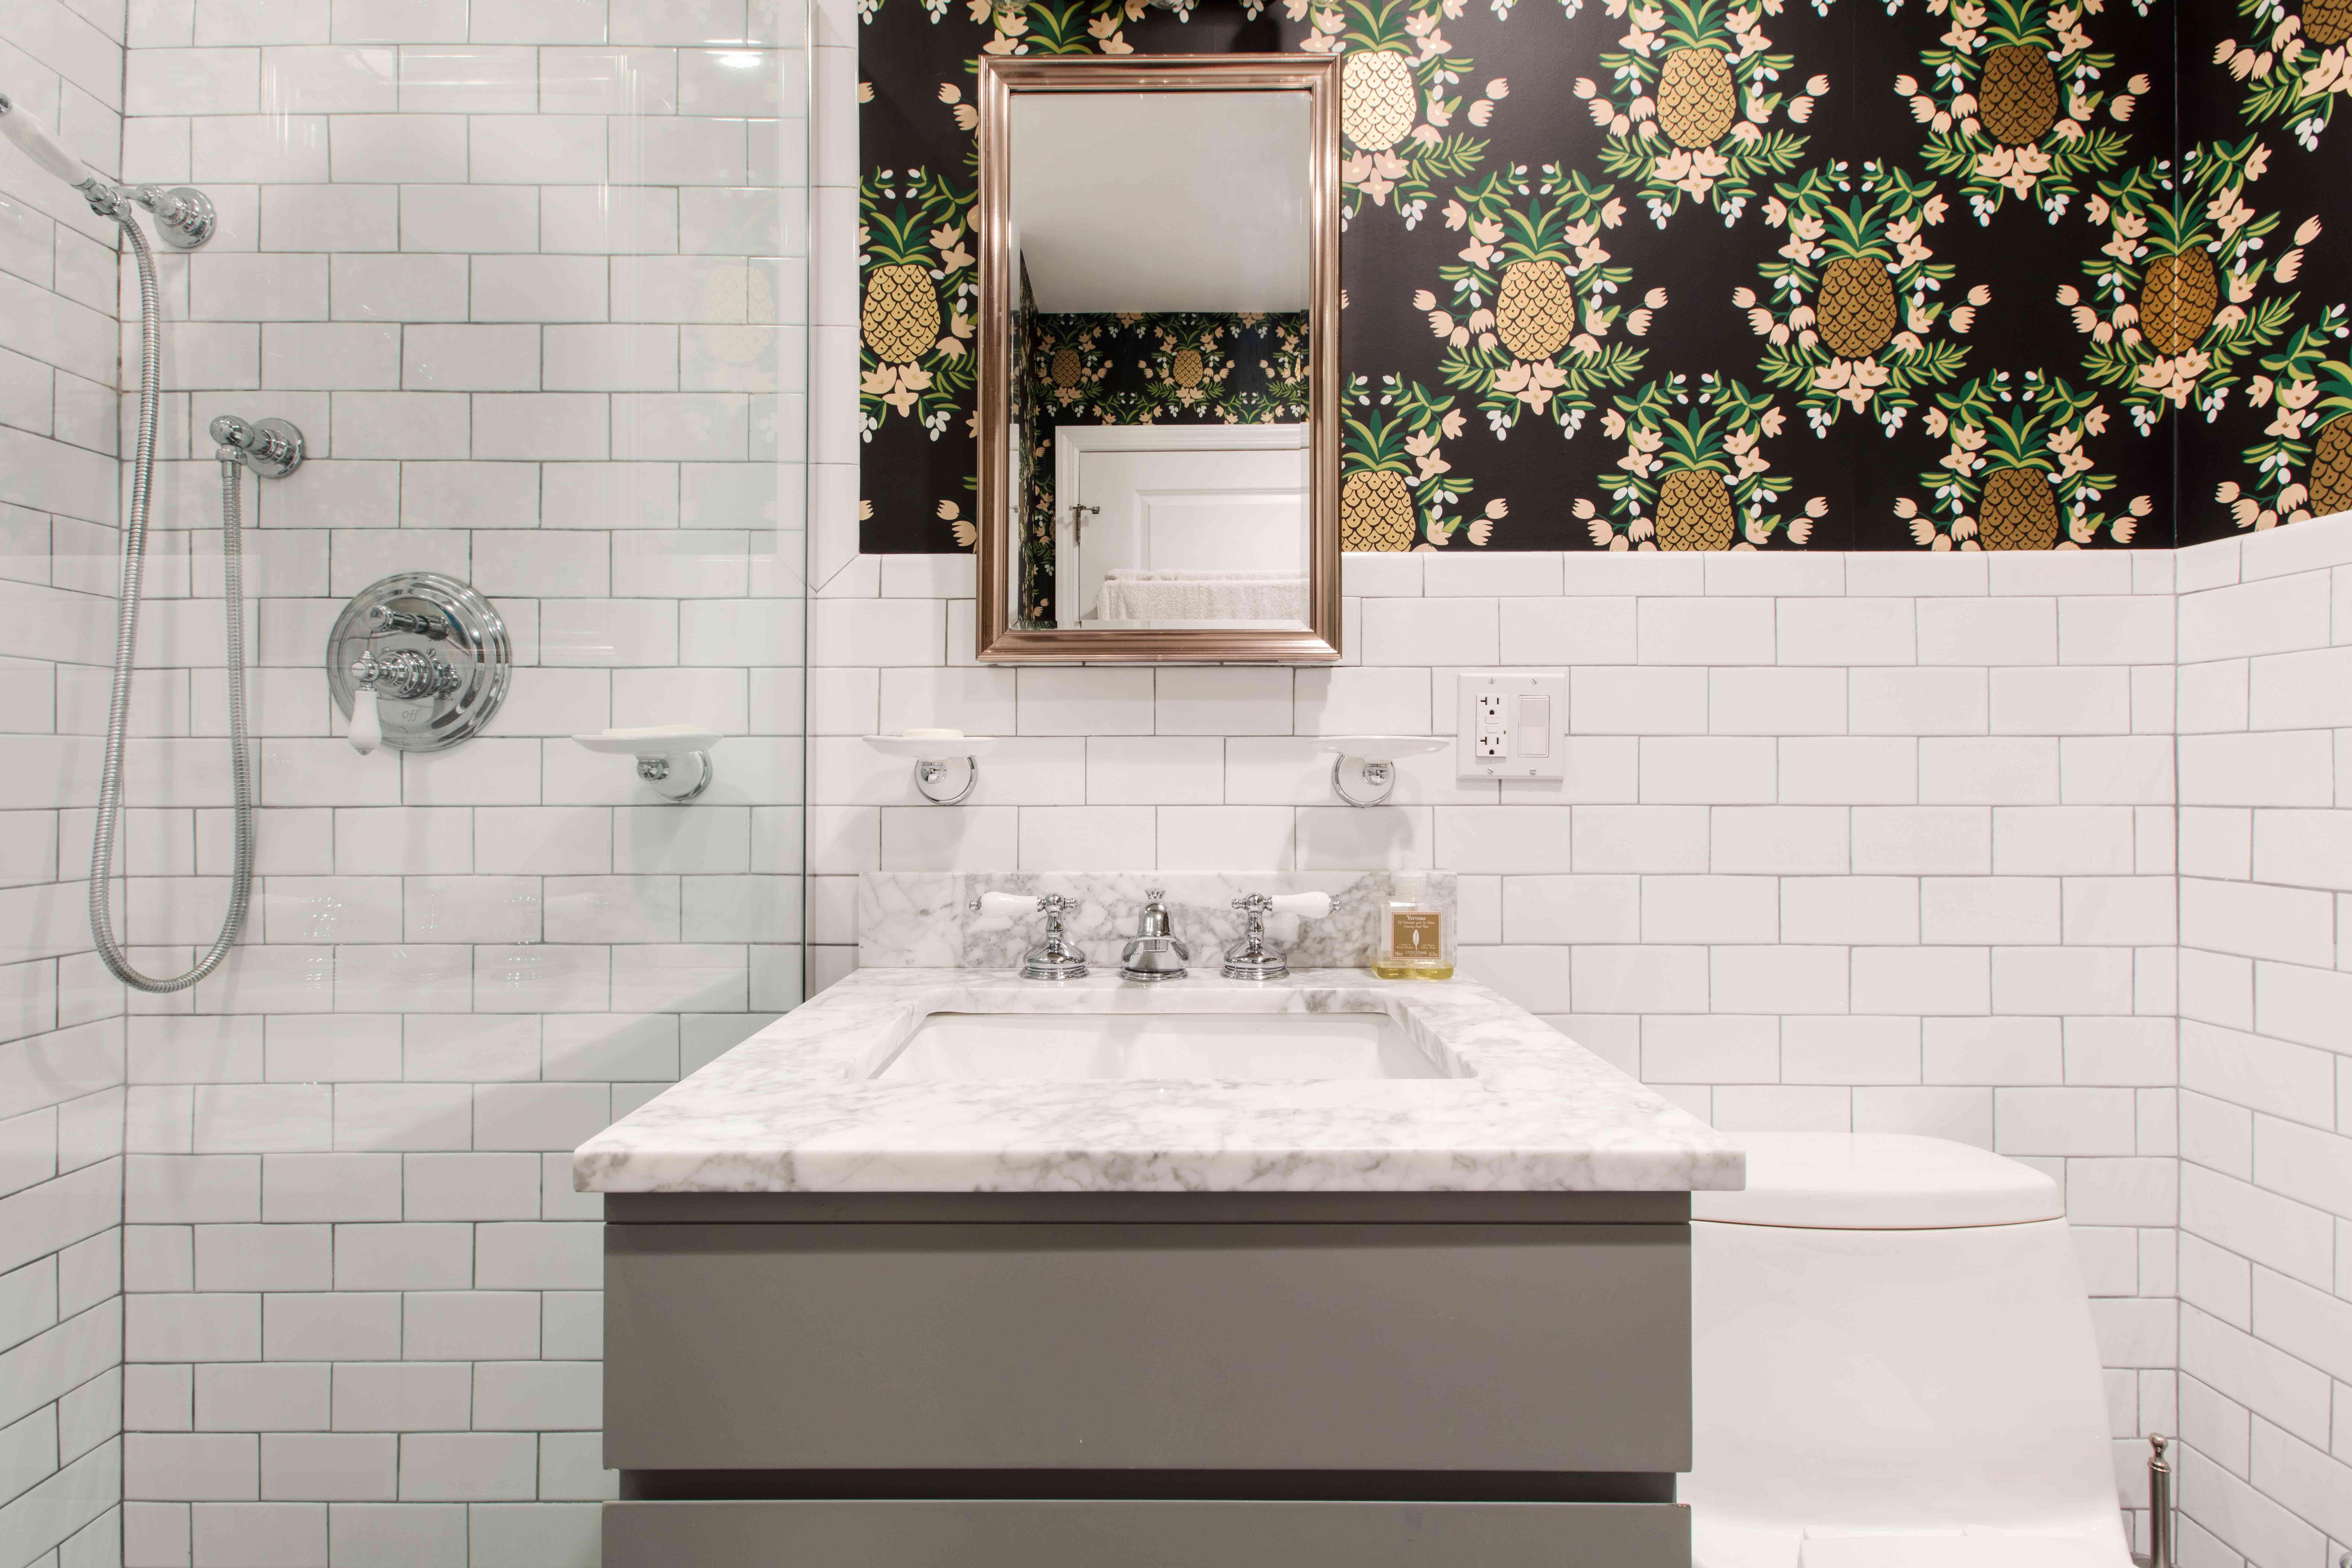 Pineapple-wallpaper-small-bathroom